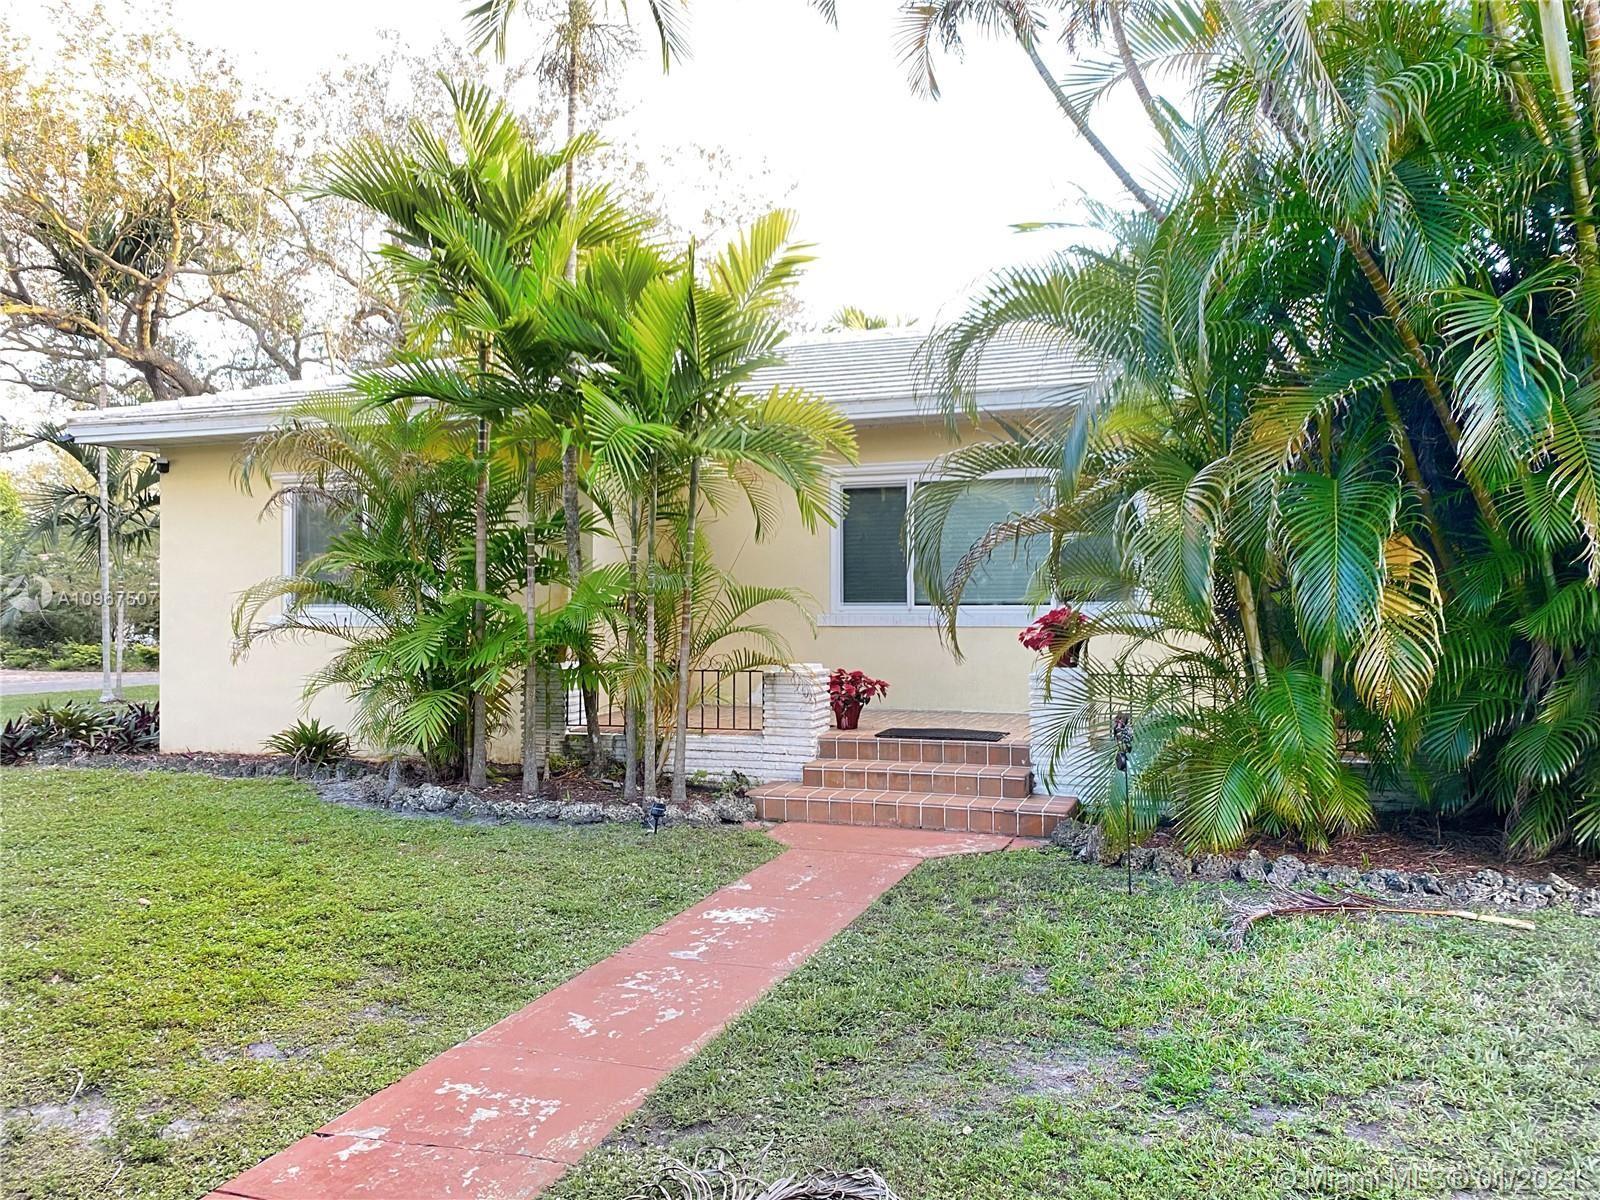 350 NE 107 Street, Miami Shores, FL 33161 - #: A10967507